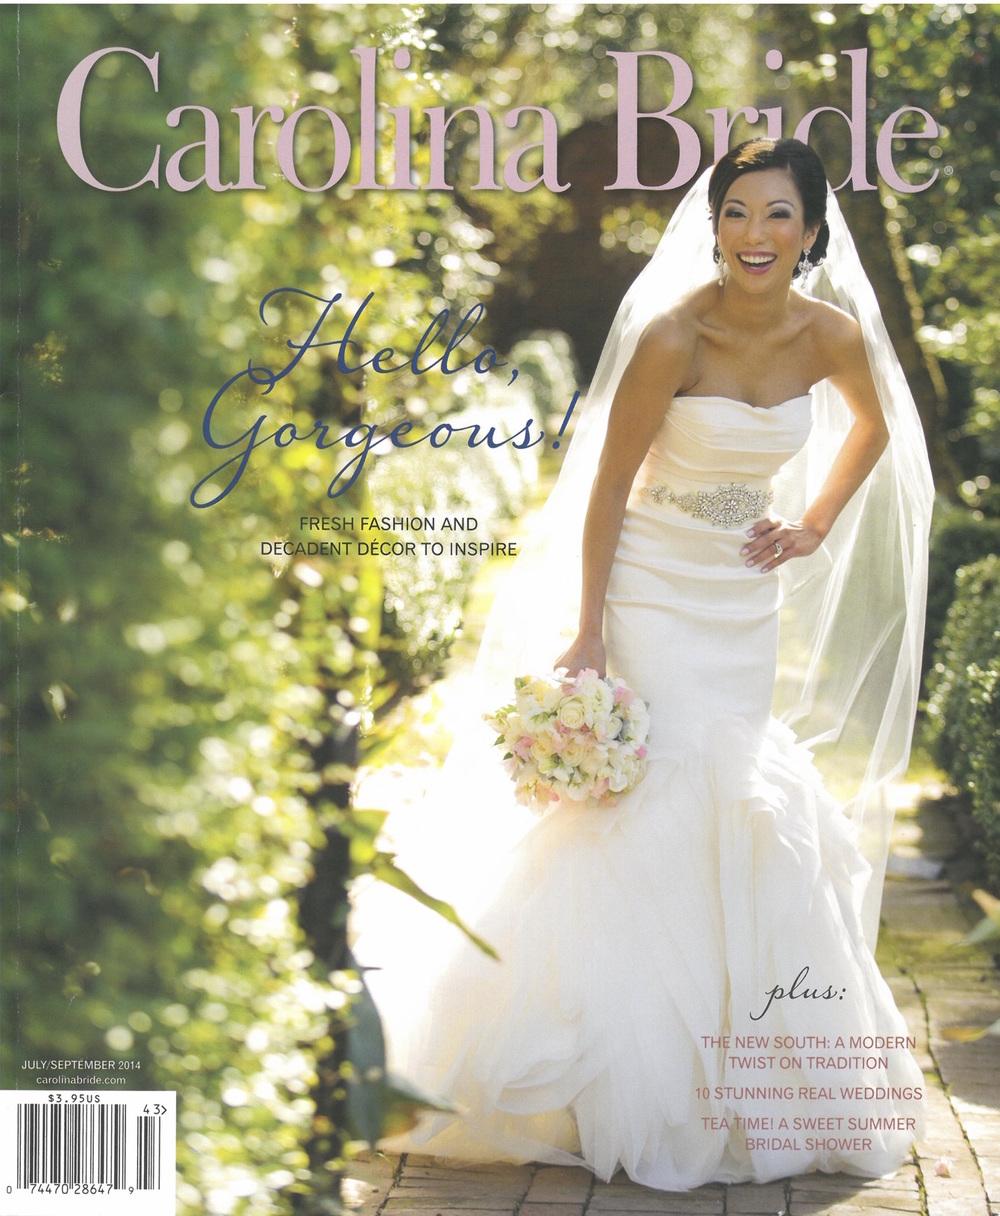 Carolina Bride July : September 2014 cover .jpg